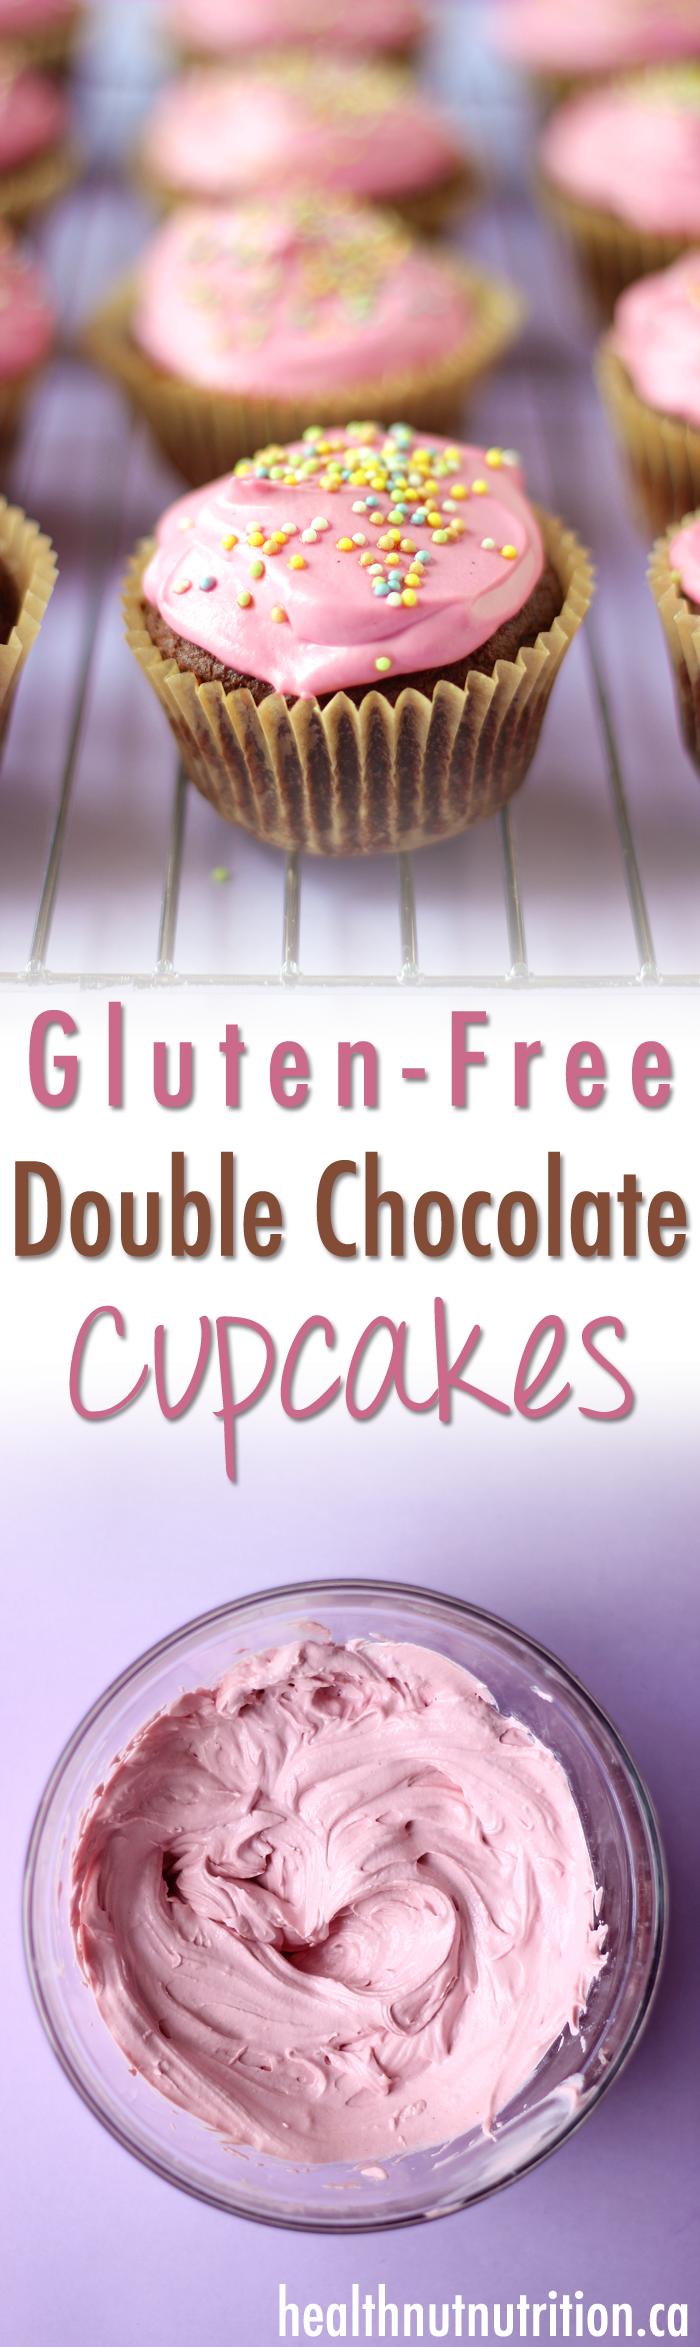 100k-cupcakes-pinterest